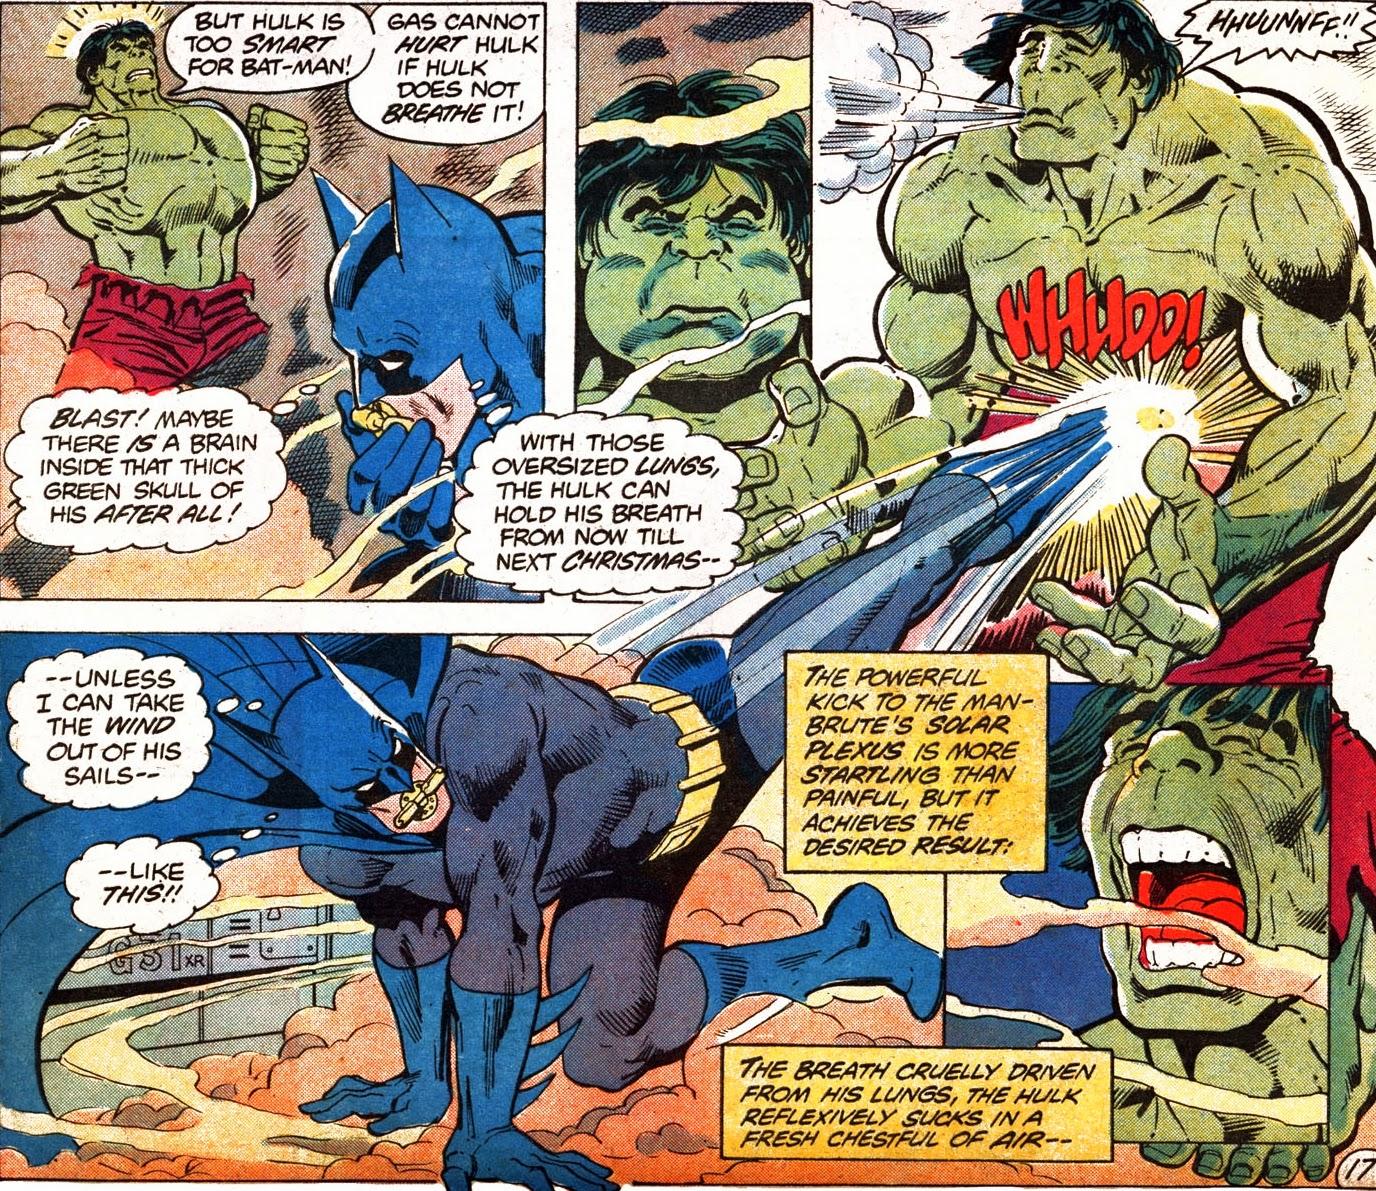 http://2.bp.blogspot.com/-ZsO2DUGl5vA/Ulm_MkOCqhI/AAAAAAAAlco/dU0LpAc2JKU/s1600/batman_vs_the_incredible_hulk.jpg